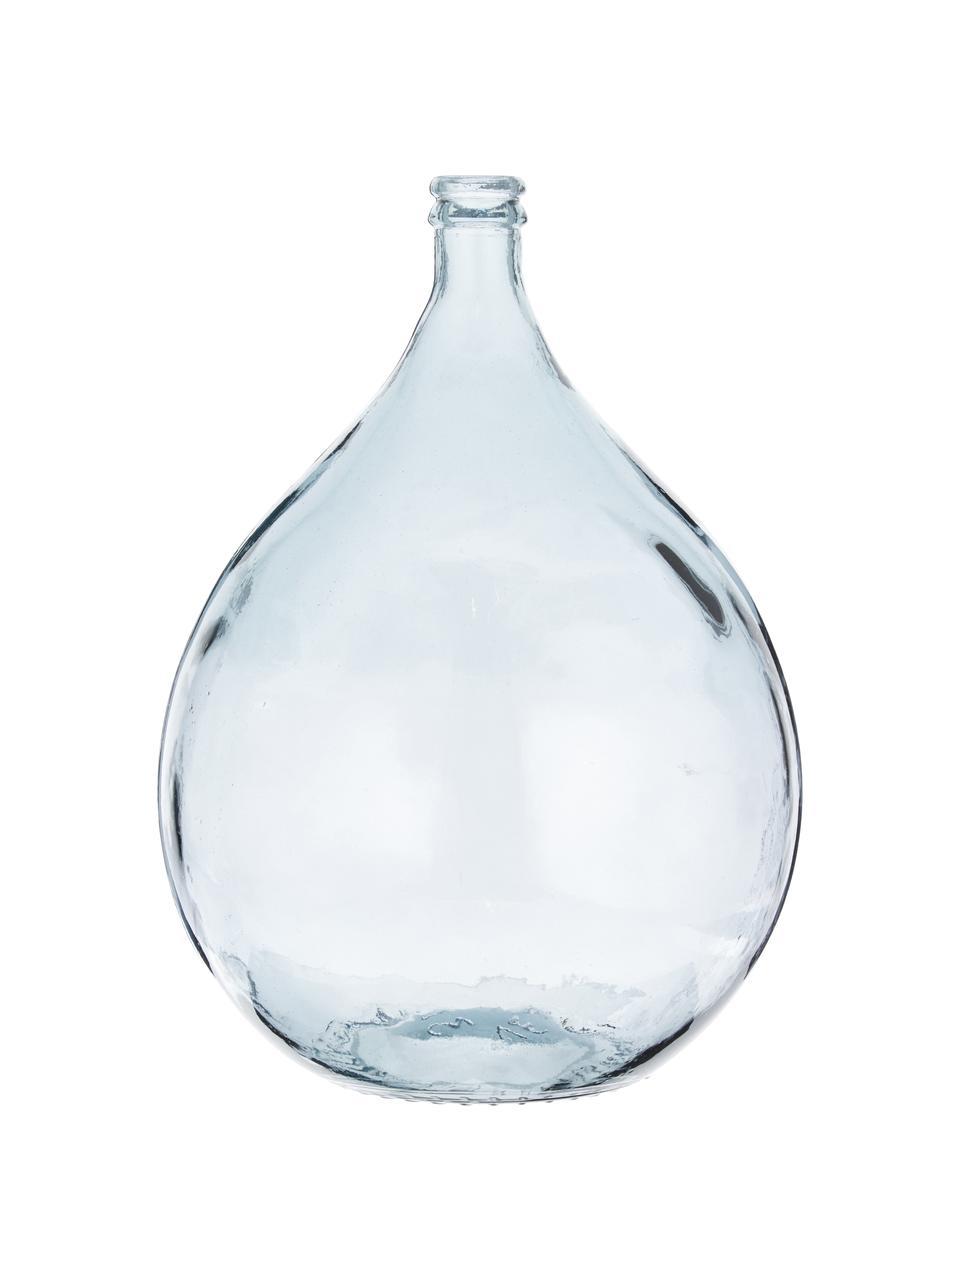 Vaso da terra in vetro riciclato Drop, Vetro riciclato, Blu, Ø 40 x Alt. 56 cm